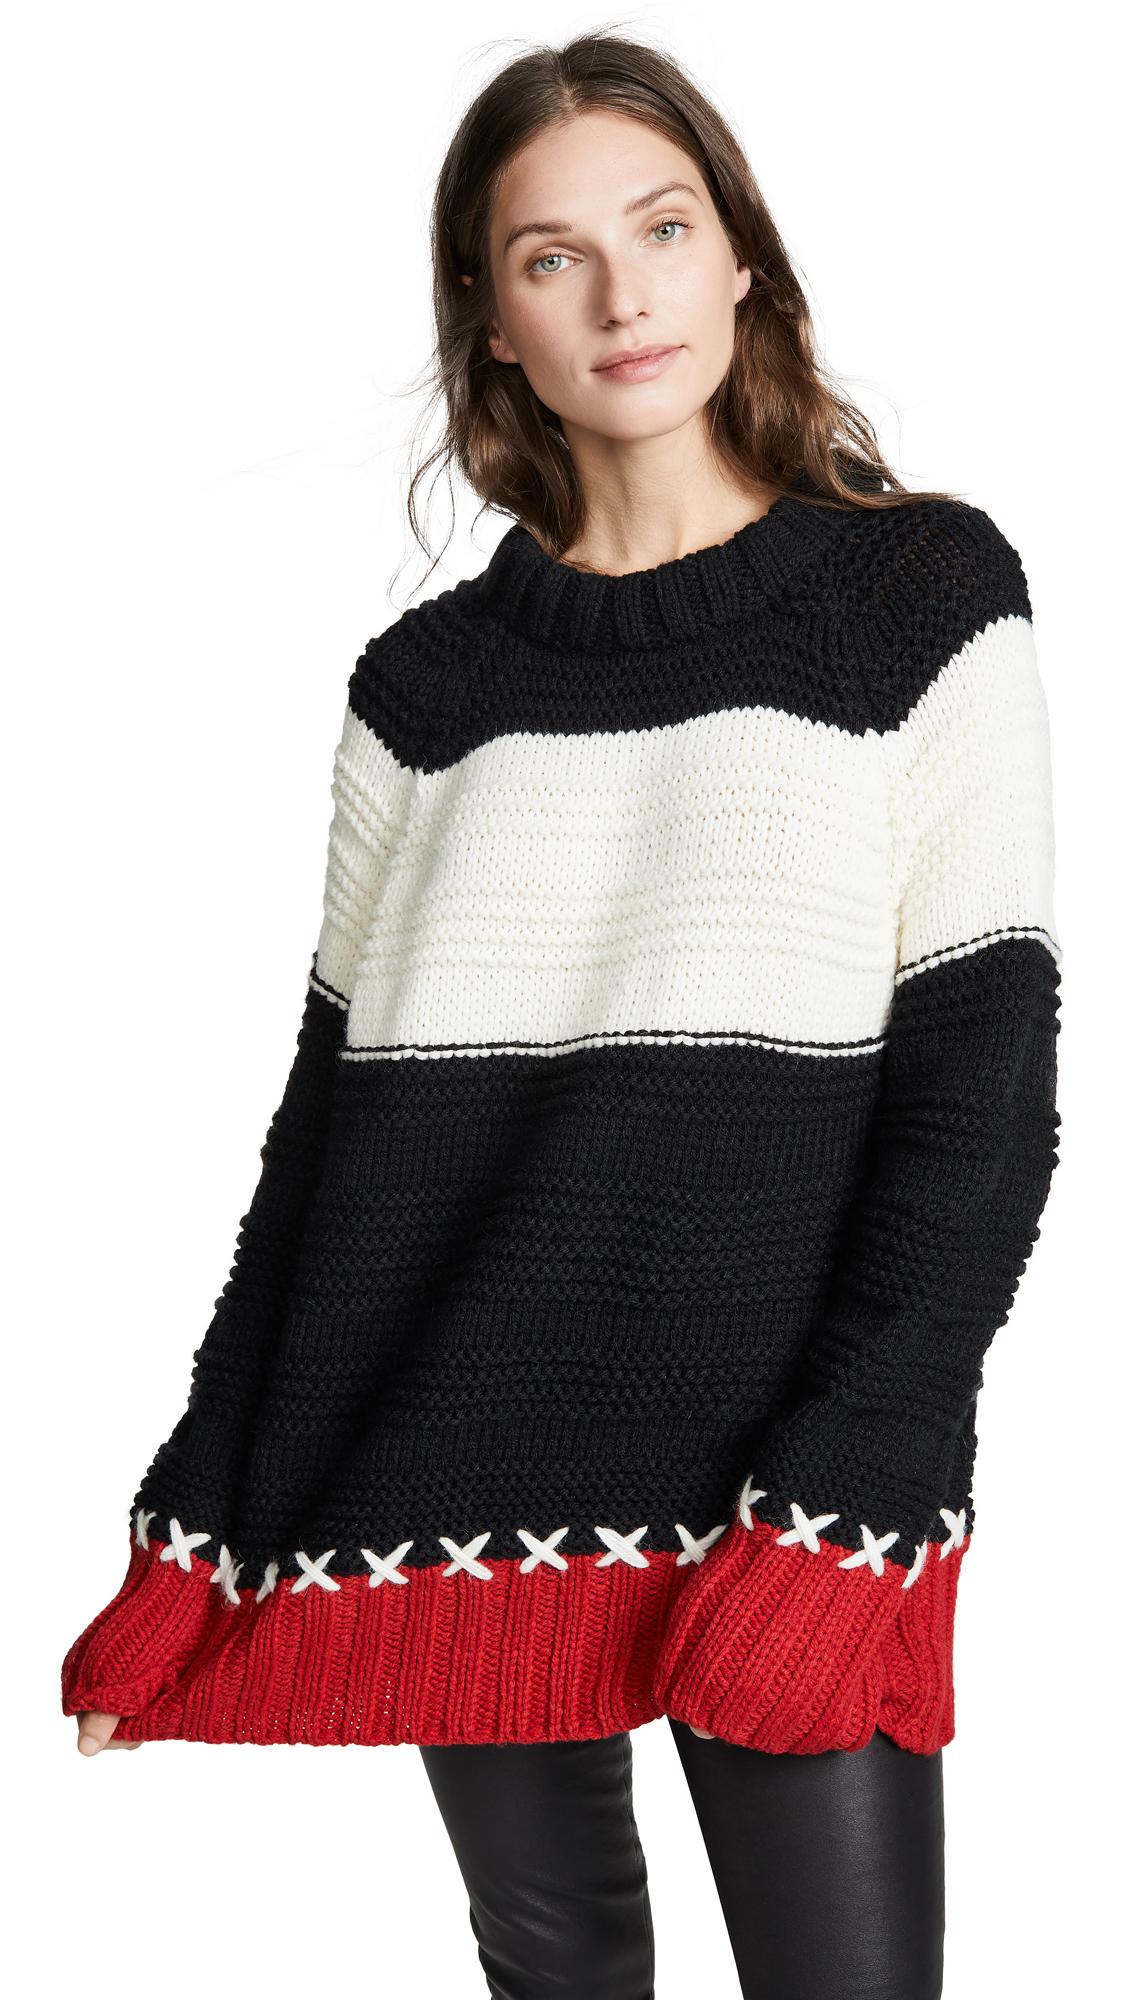 SMYTHE Stripe Cross Stitched Alpaca Blend Sweater in Red/Black/White